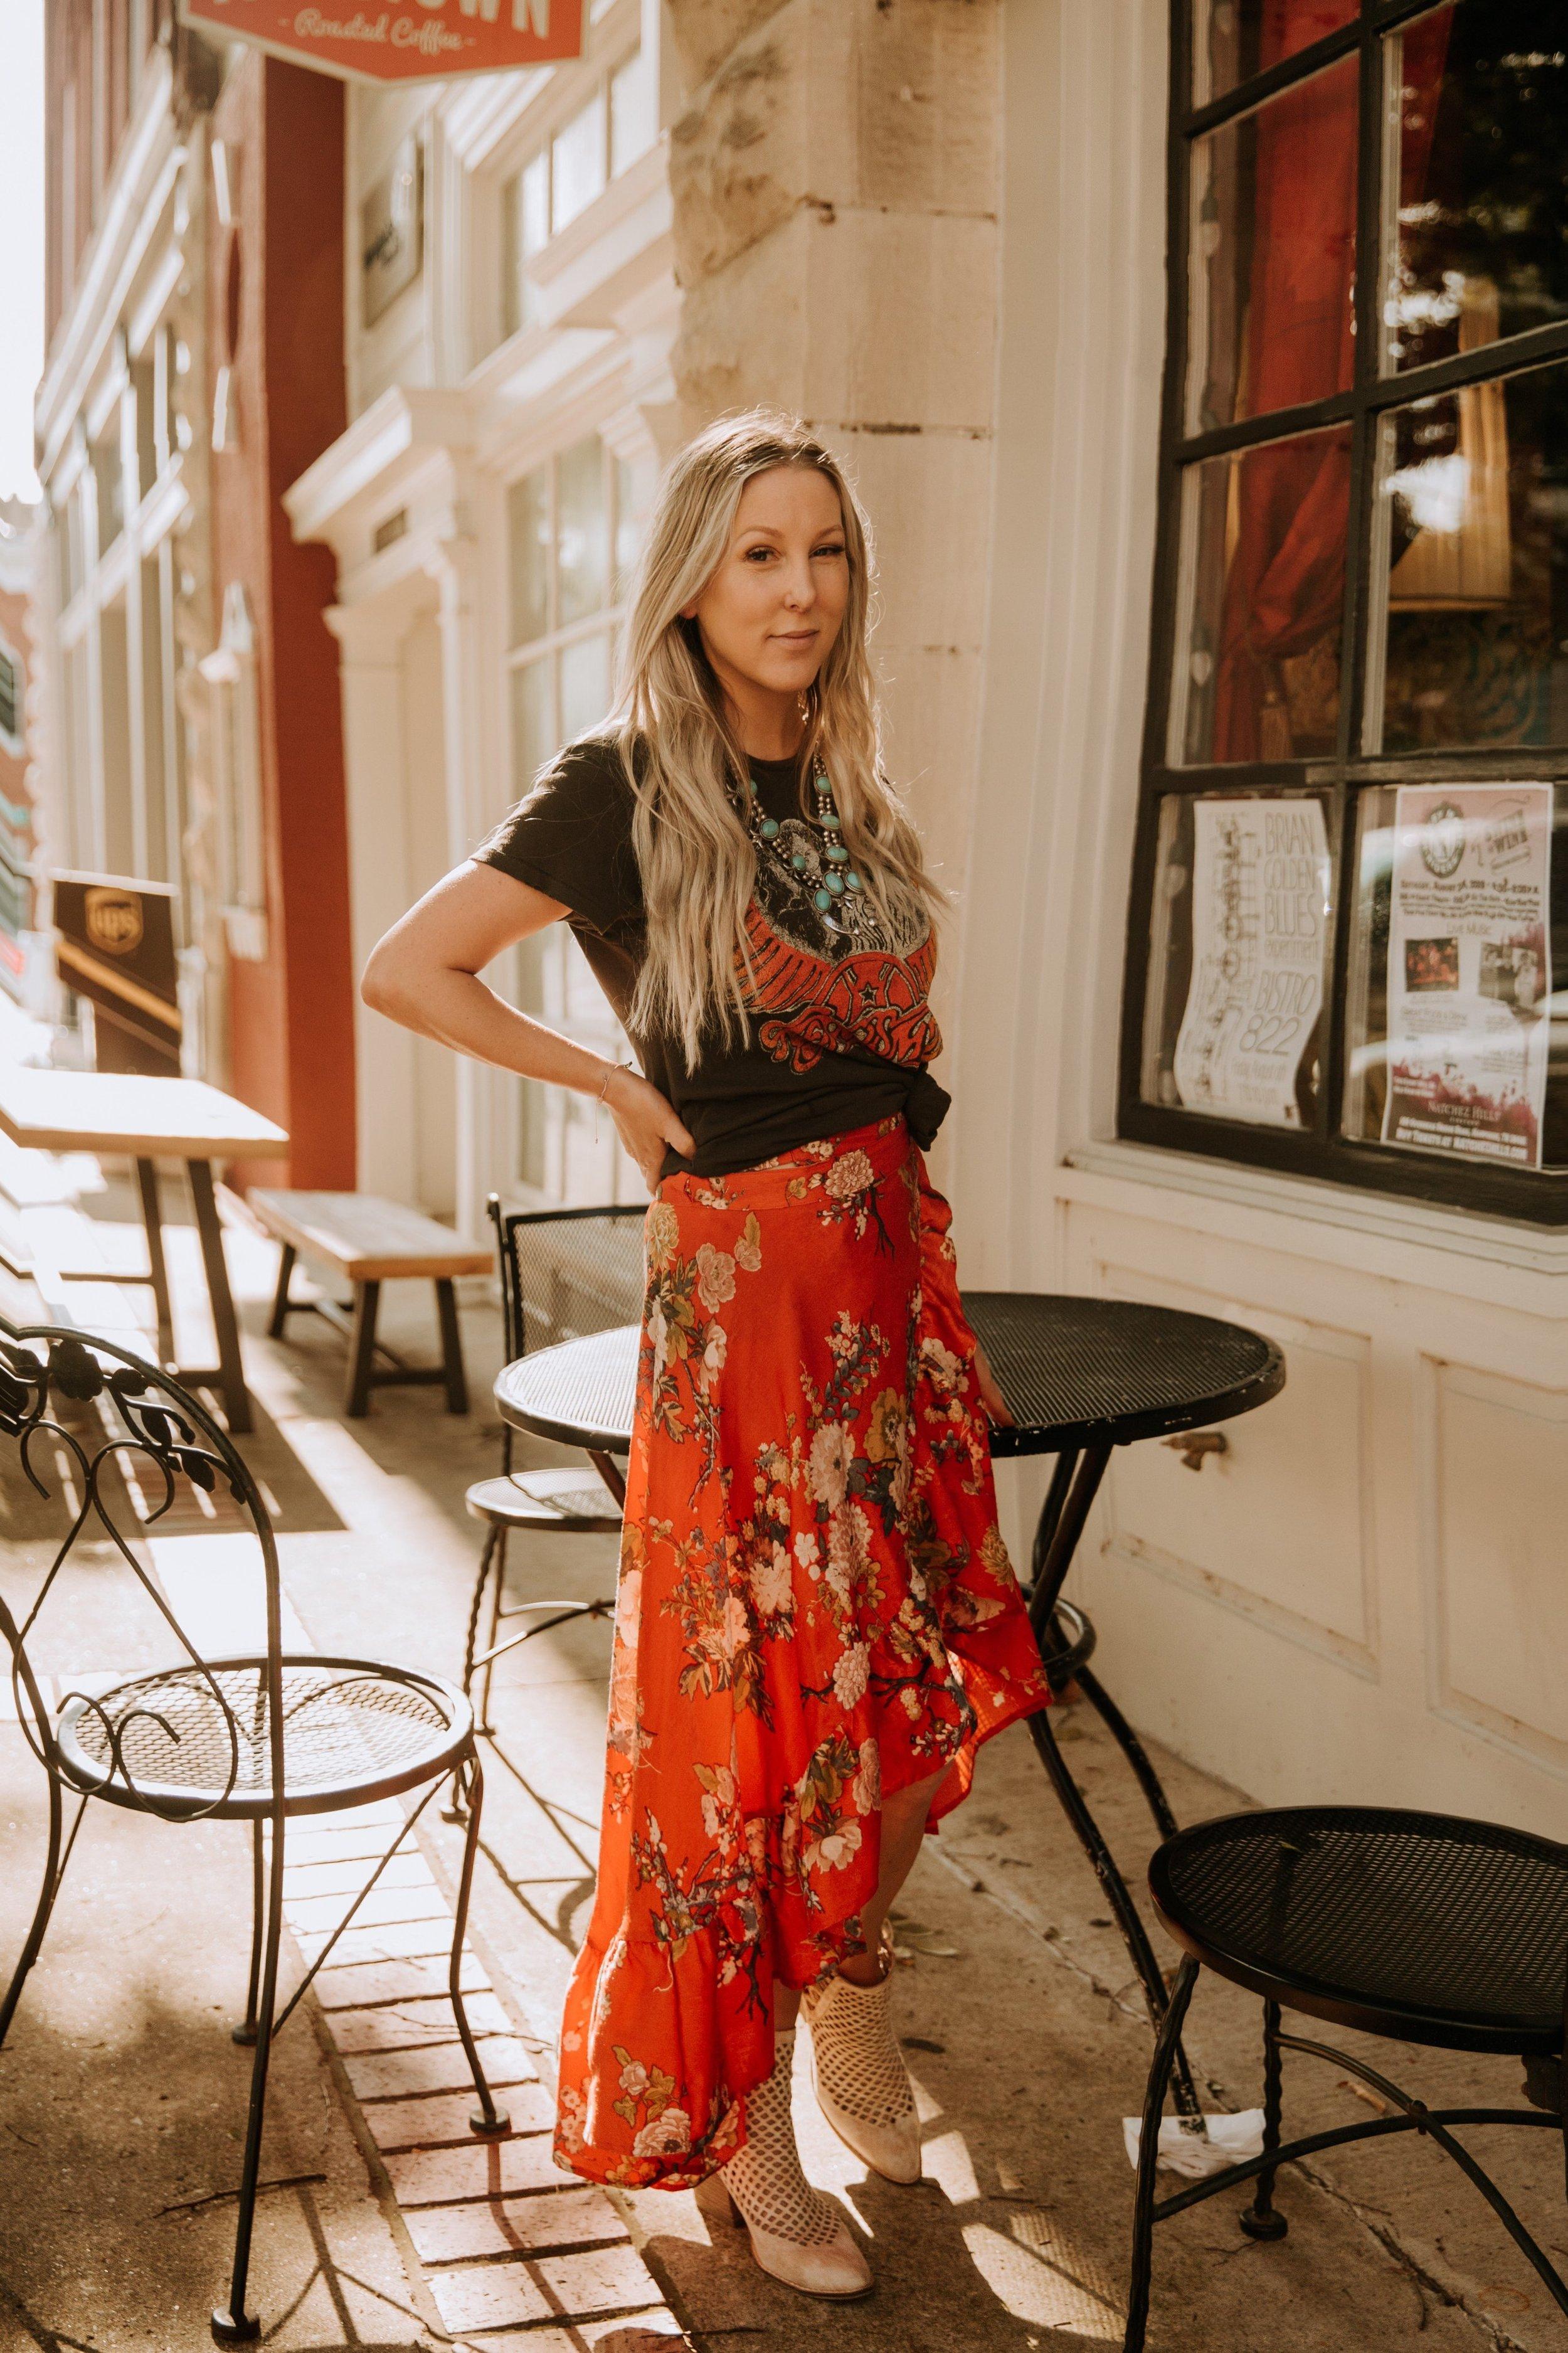 Jessie Mobley / Owner/ Head Stylist